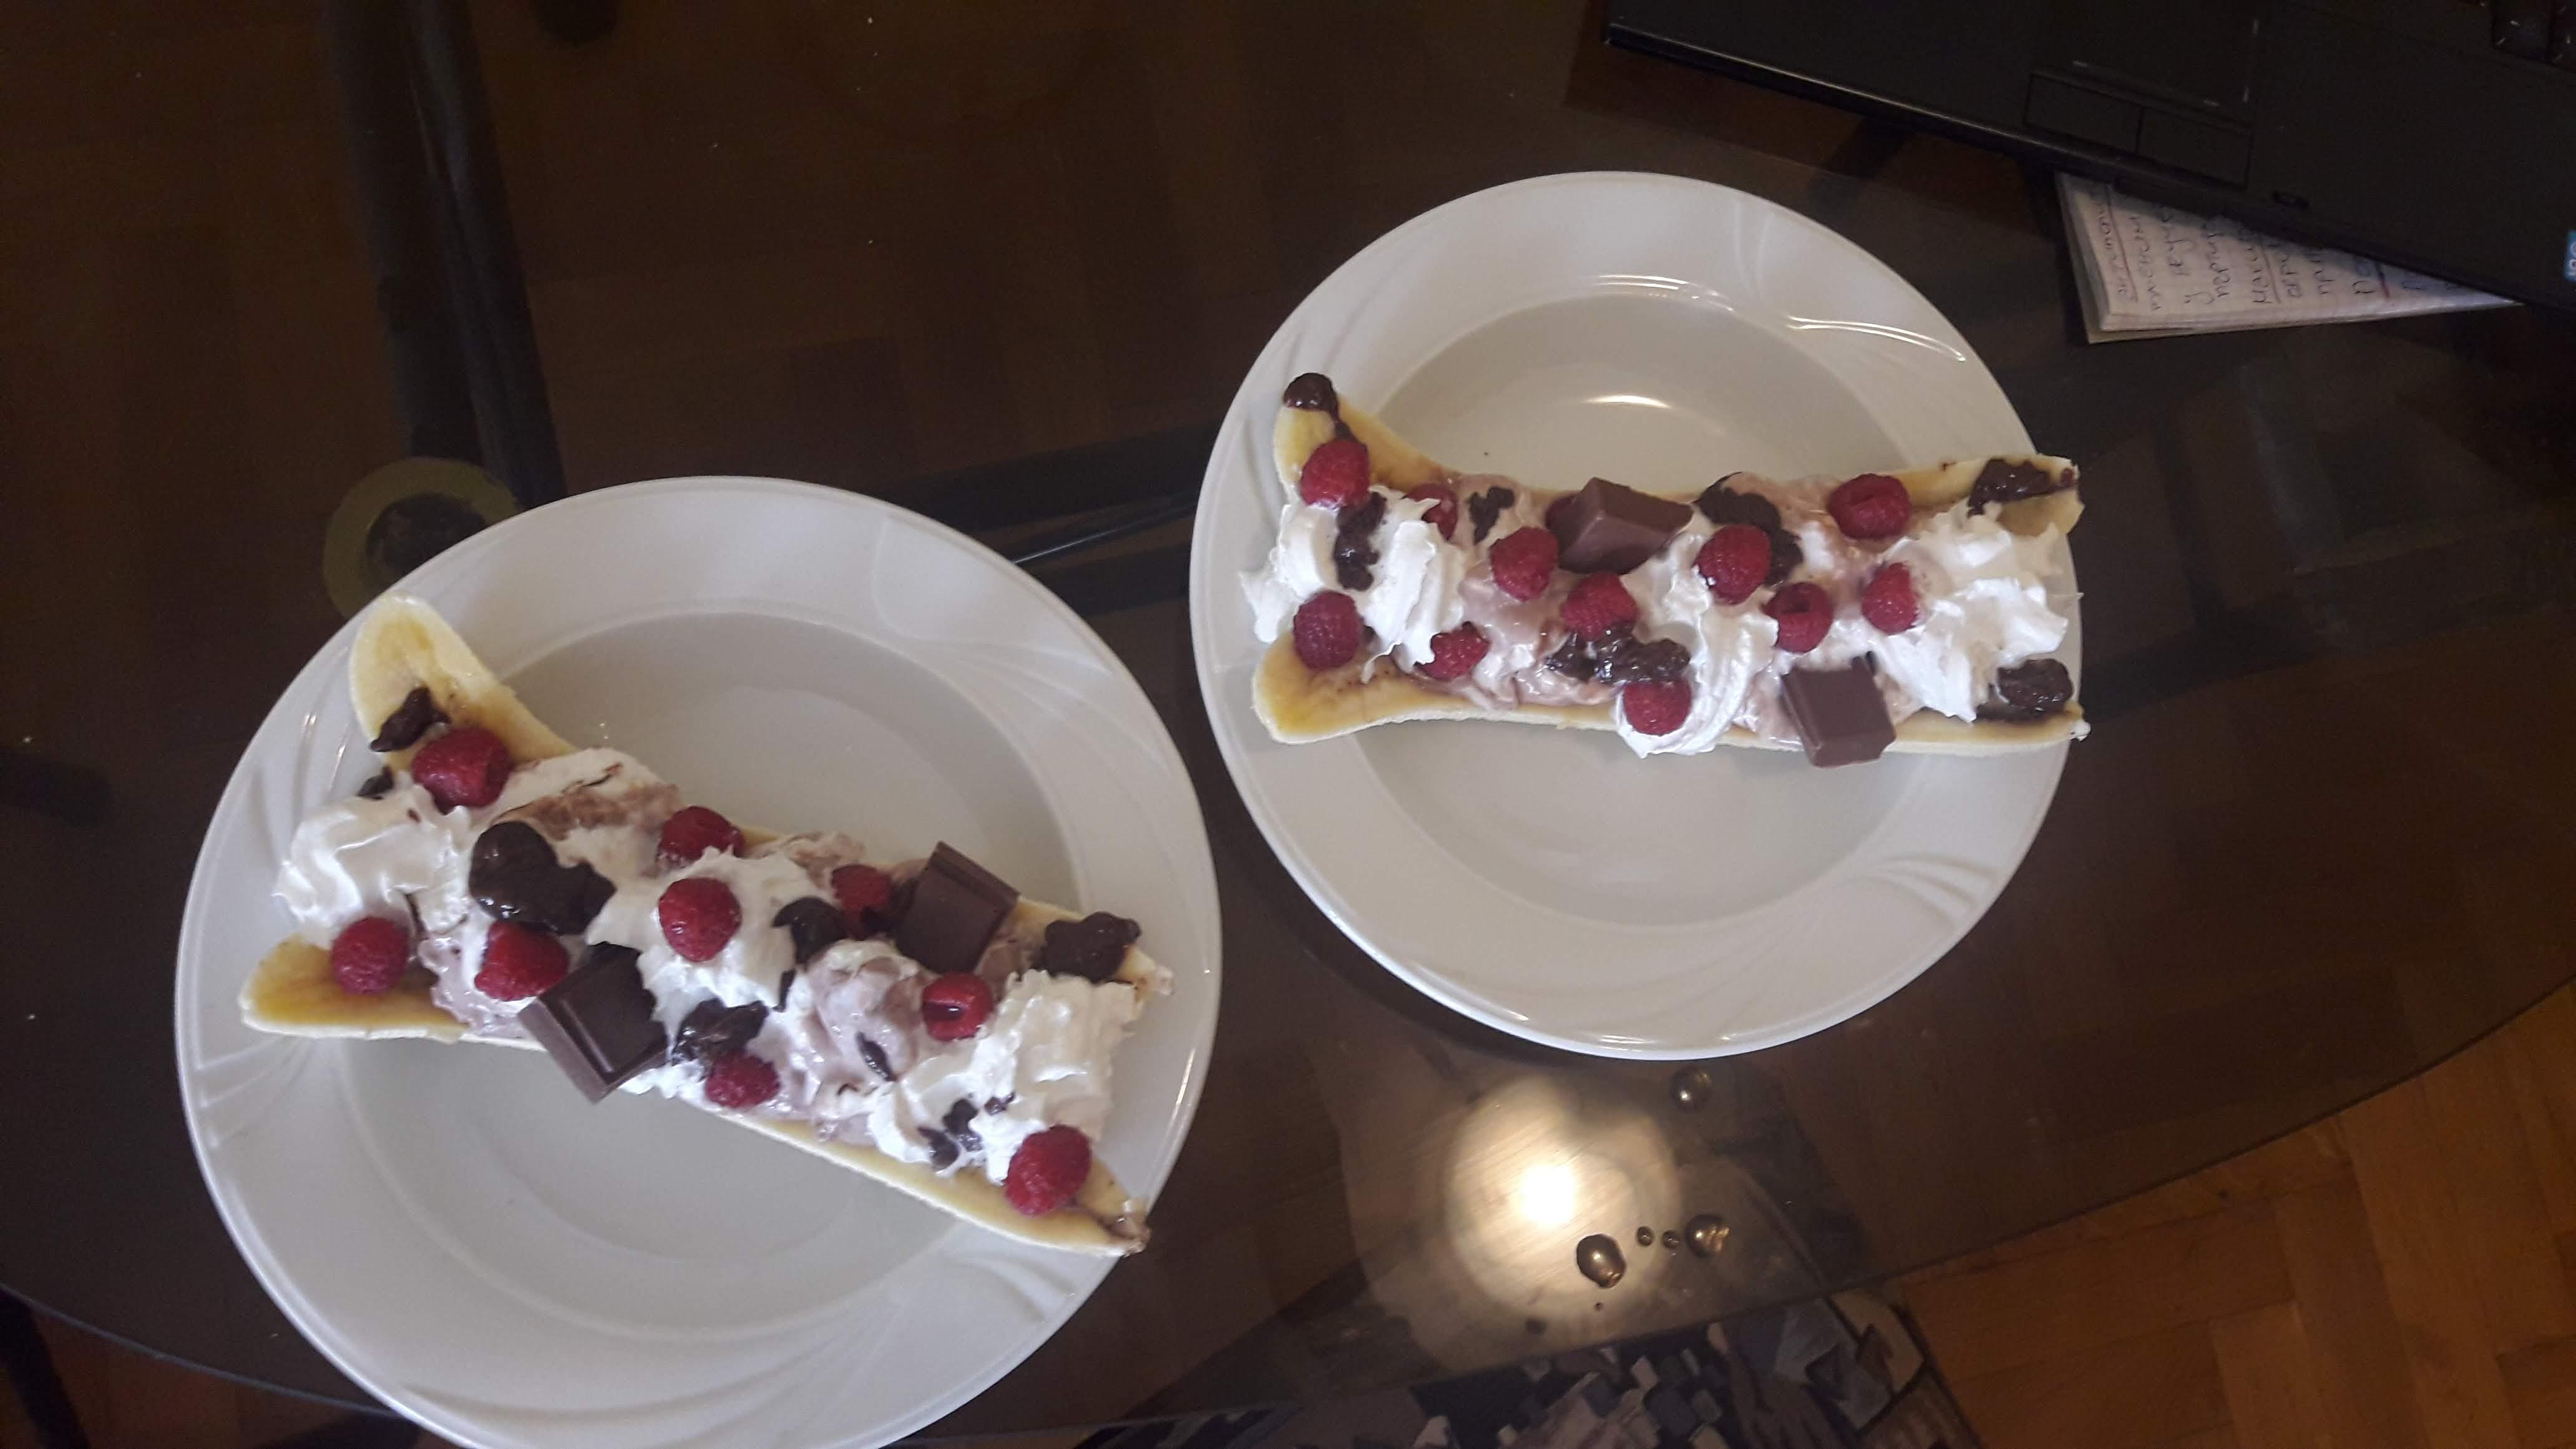 Banana Split with Raspberries Tamara Lazarevic